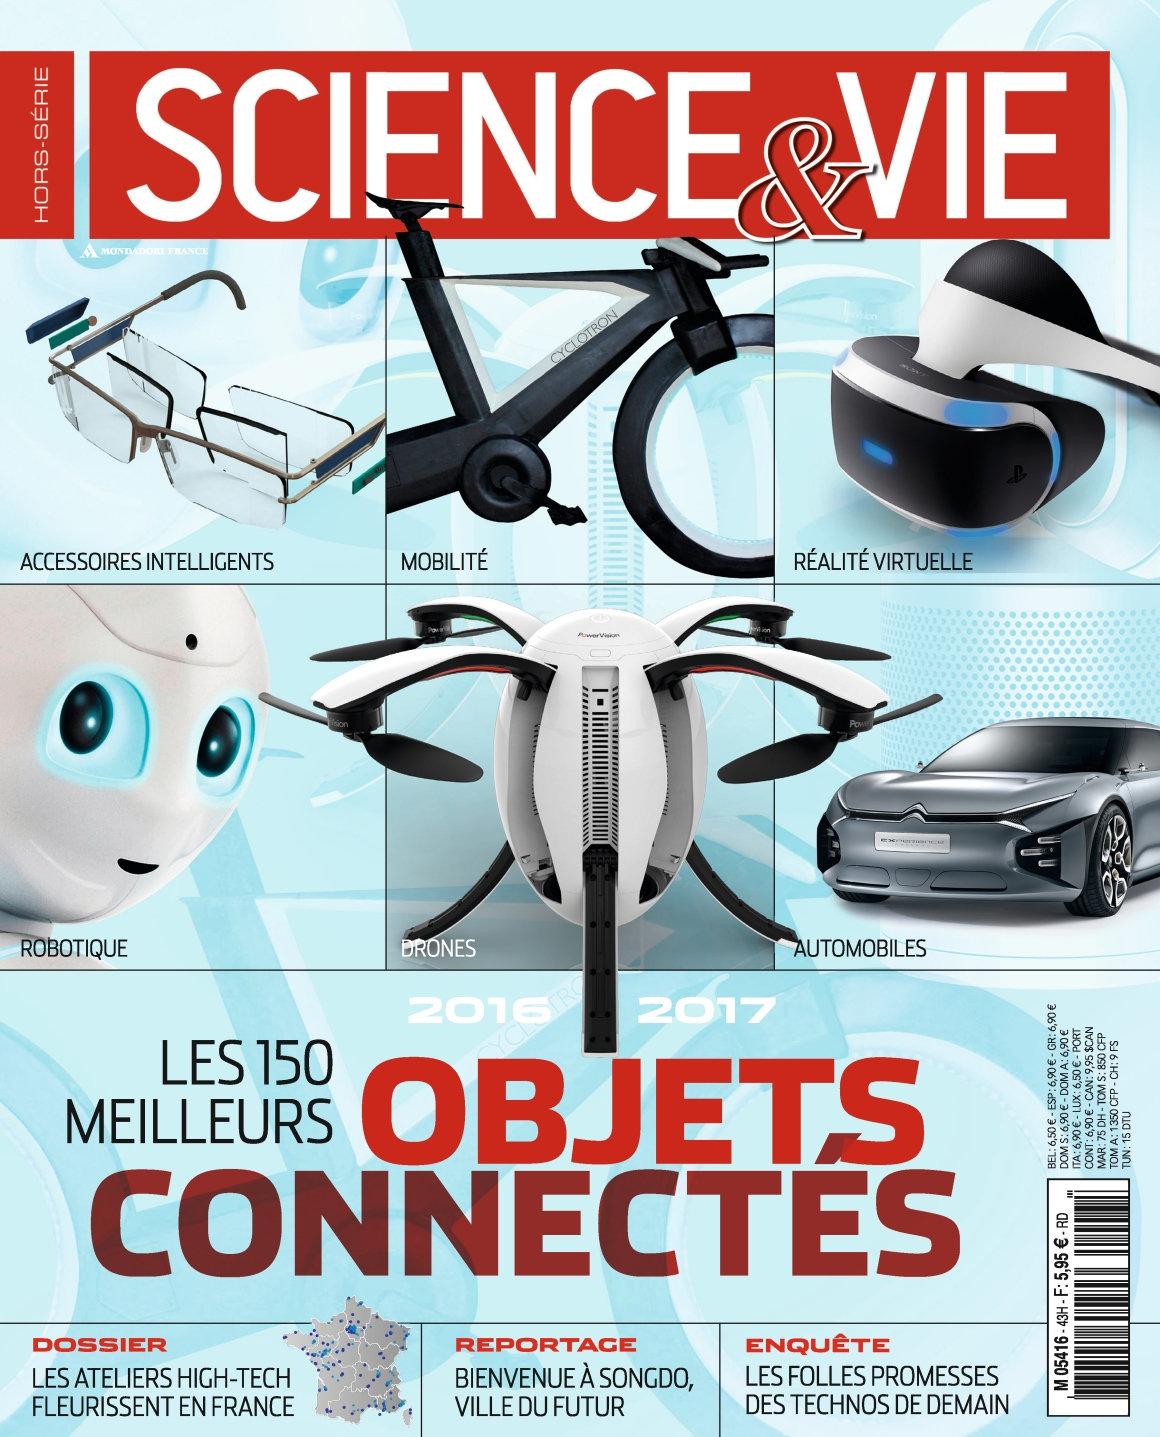 Science & vie Hors-série Spécial 43 - 2017